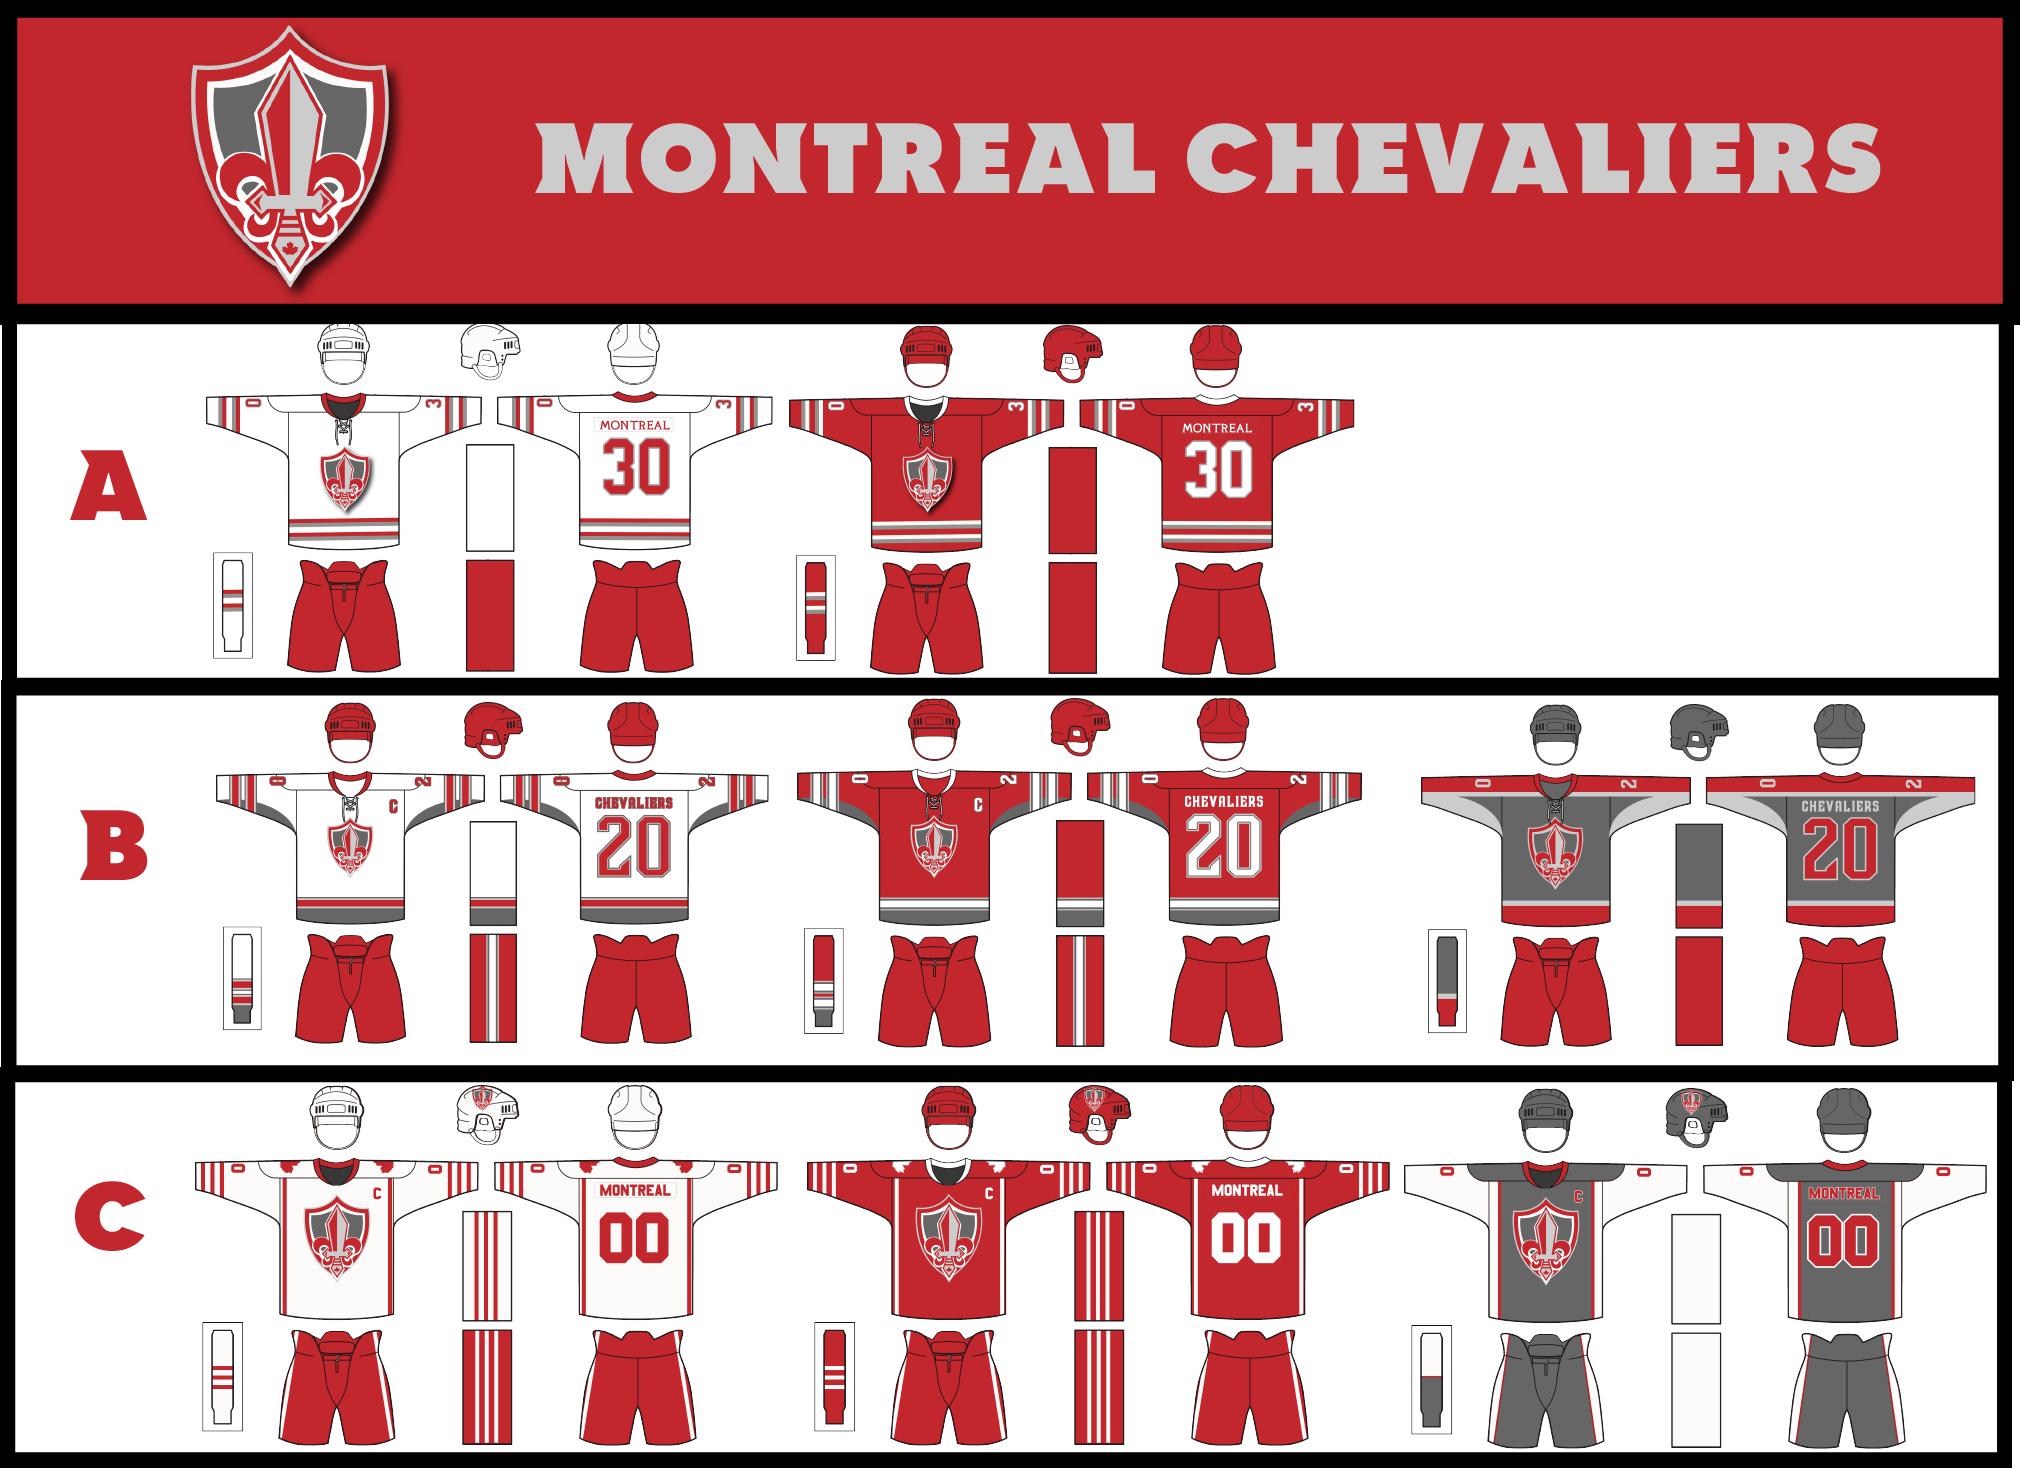 https://i.ibb.co/80c9PLn/Montreal-Chevs-Jerseys.png